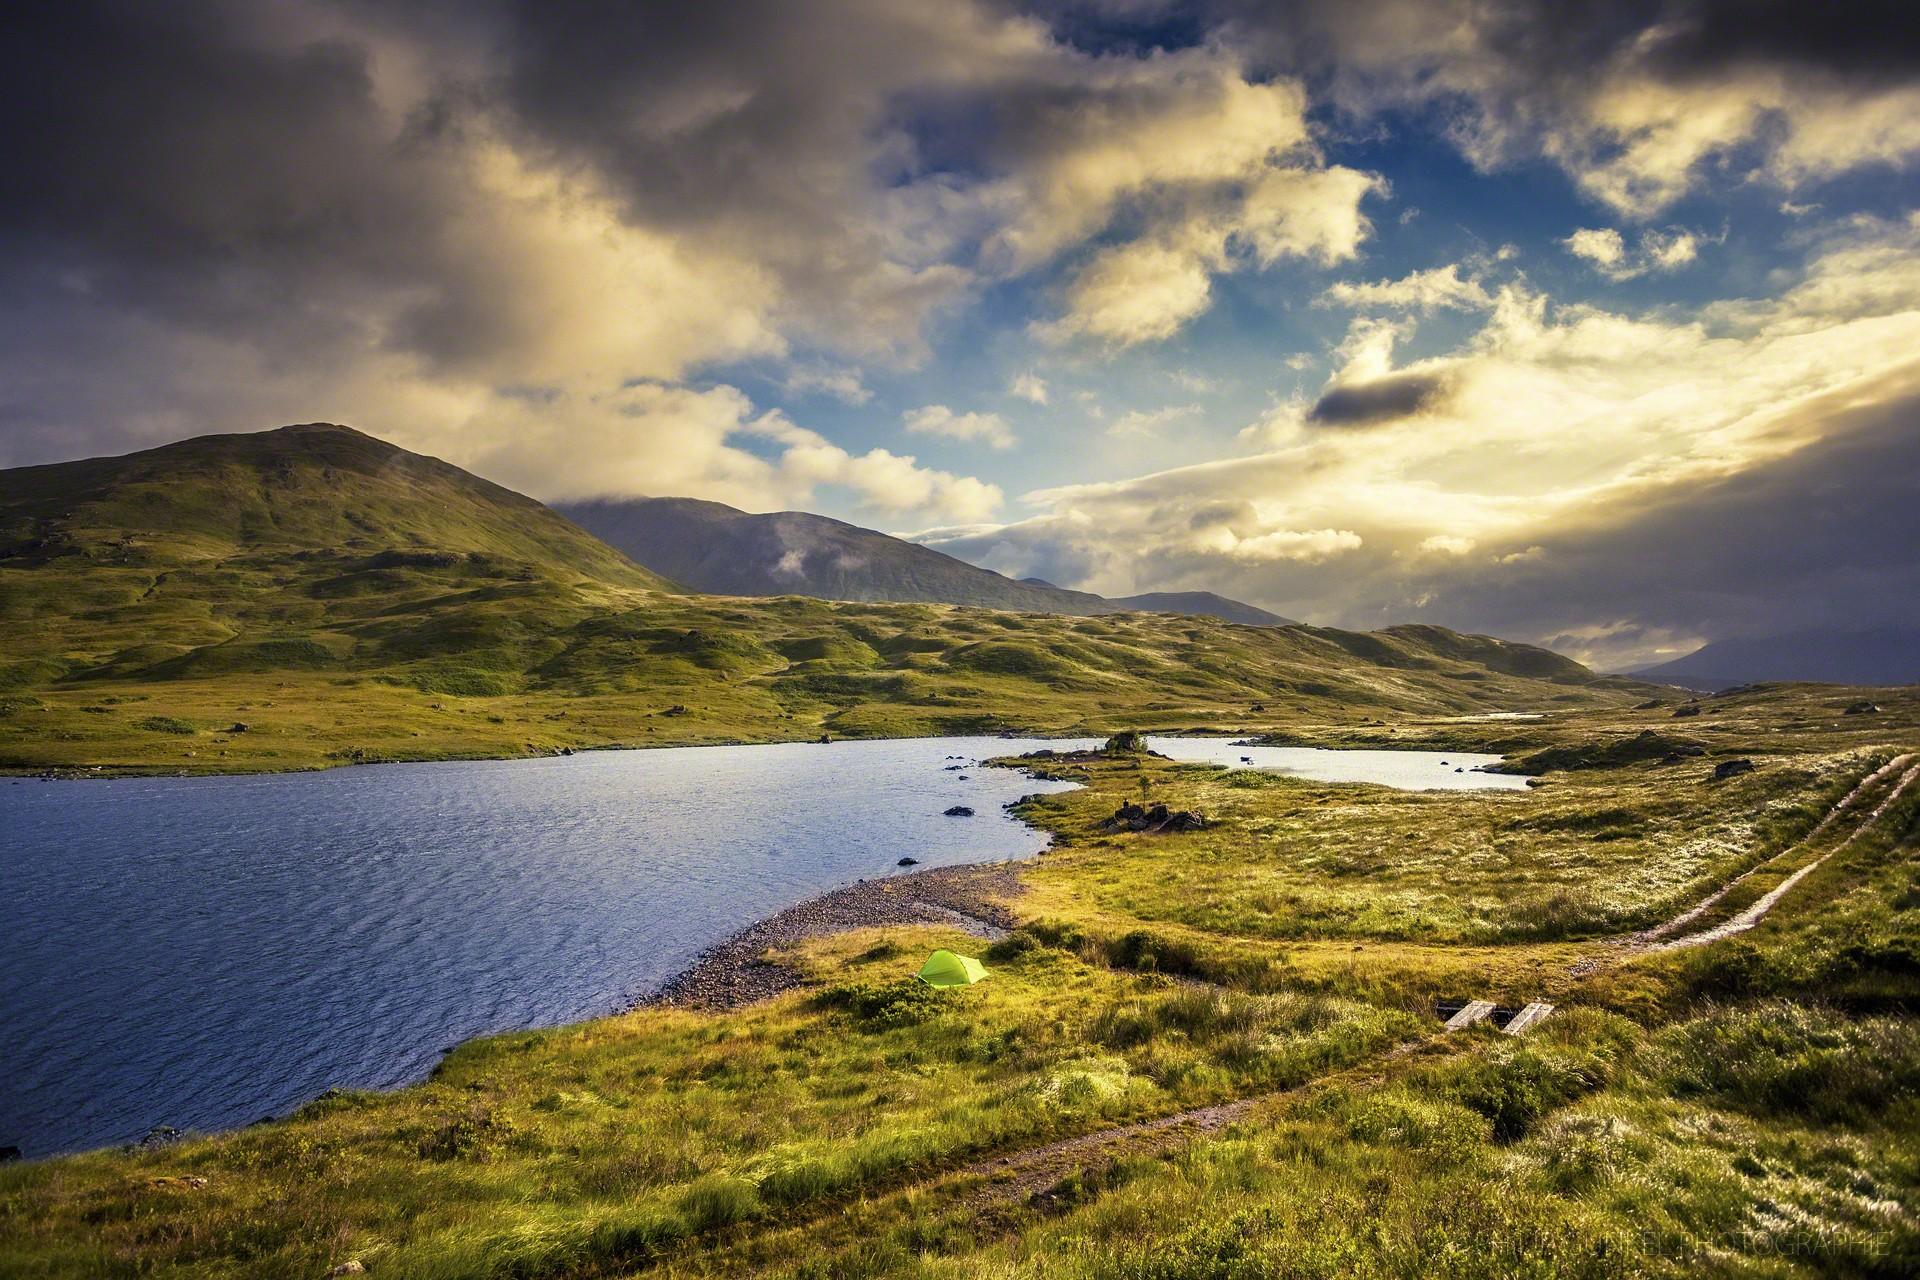 scotland_philip_gunkel_photographie_www.philipgunkel.de30